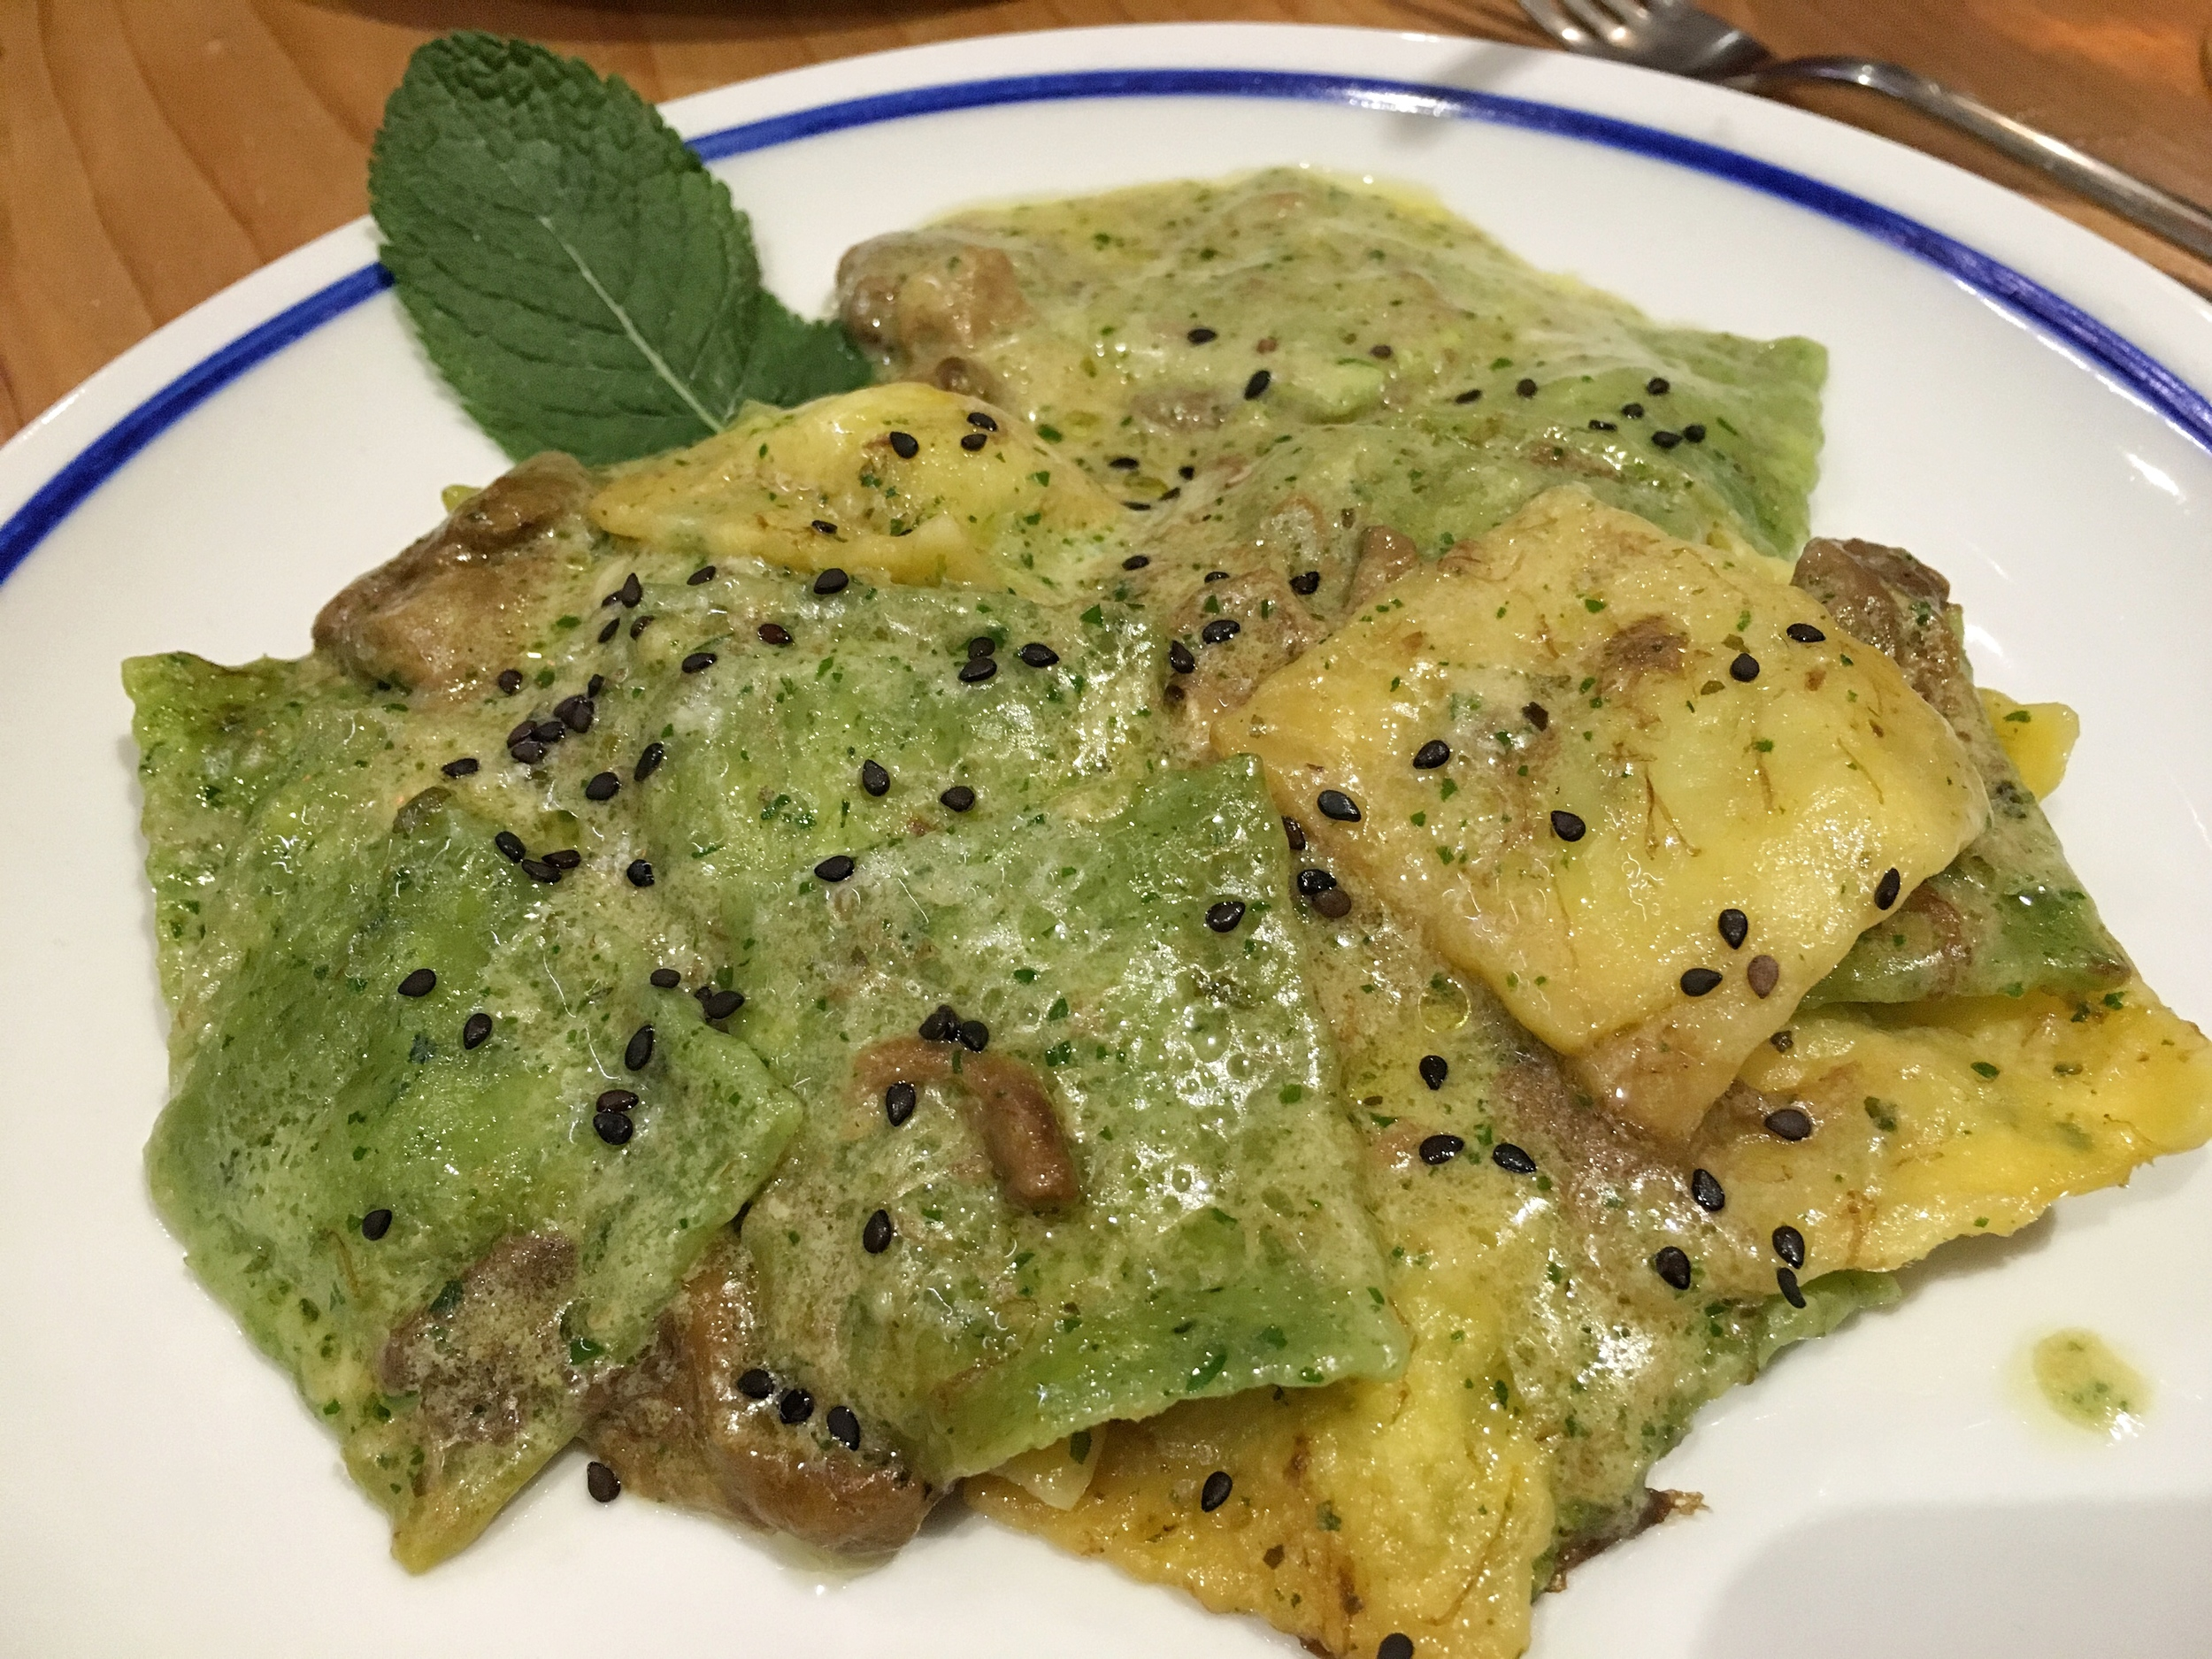 Ravioli with sesame and porcini (mushrooms)